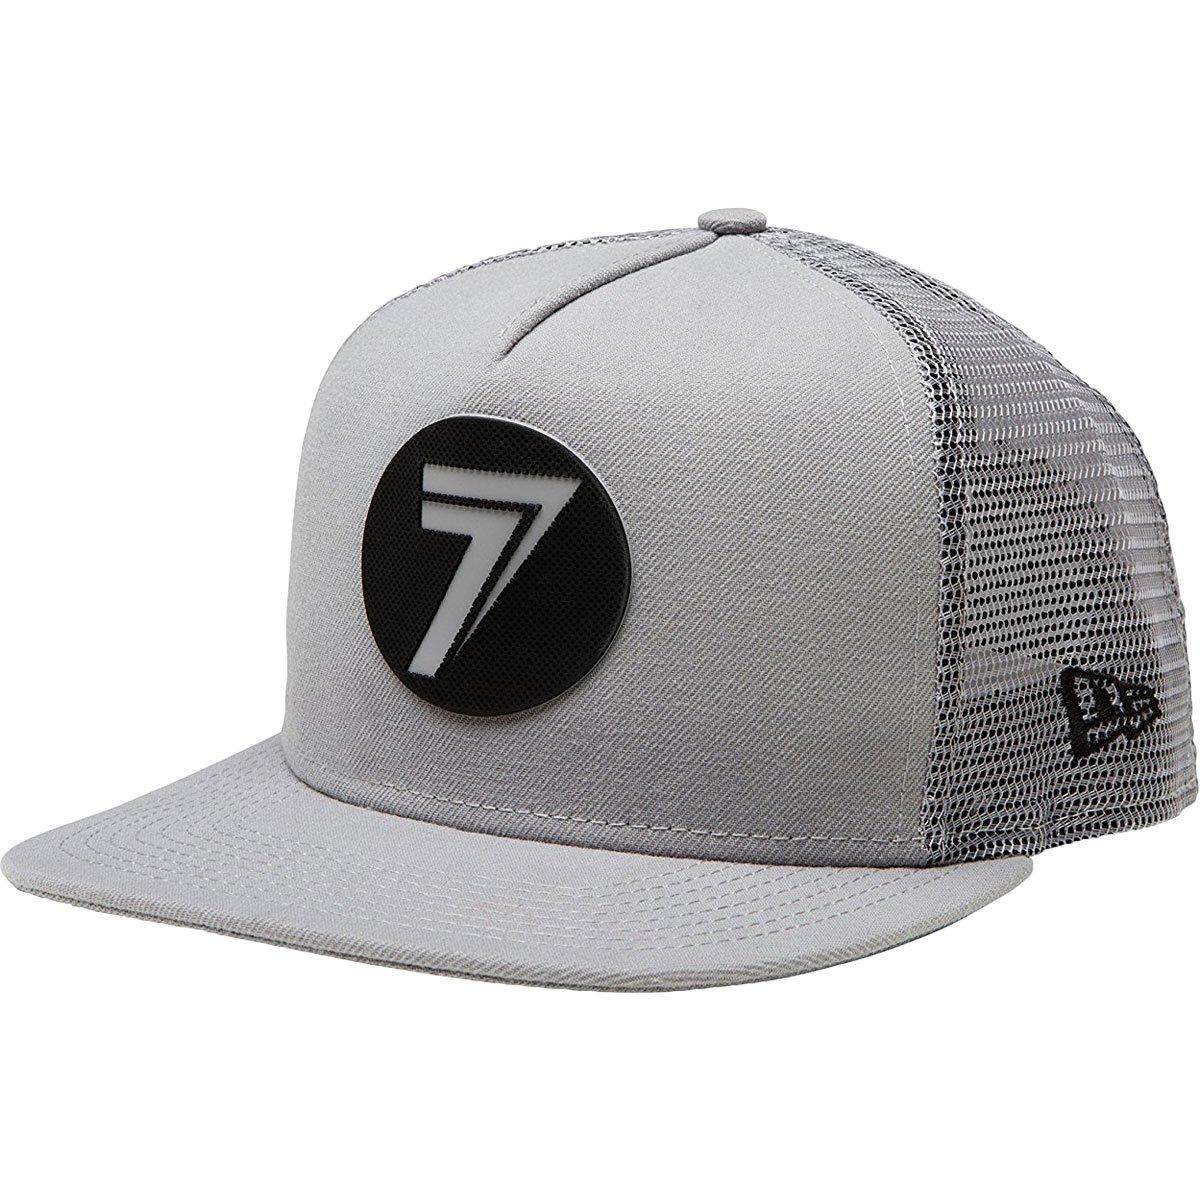 Seven Dot Mesh Snapback Hat-Gray/Black